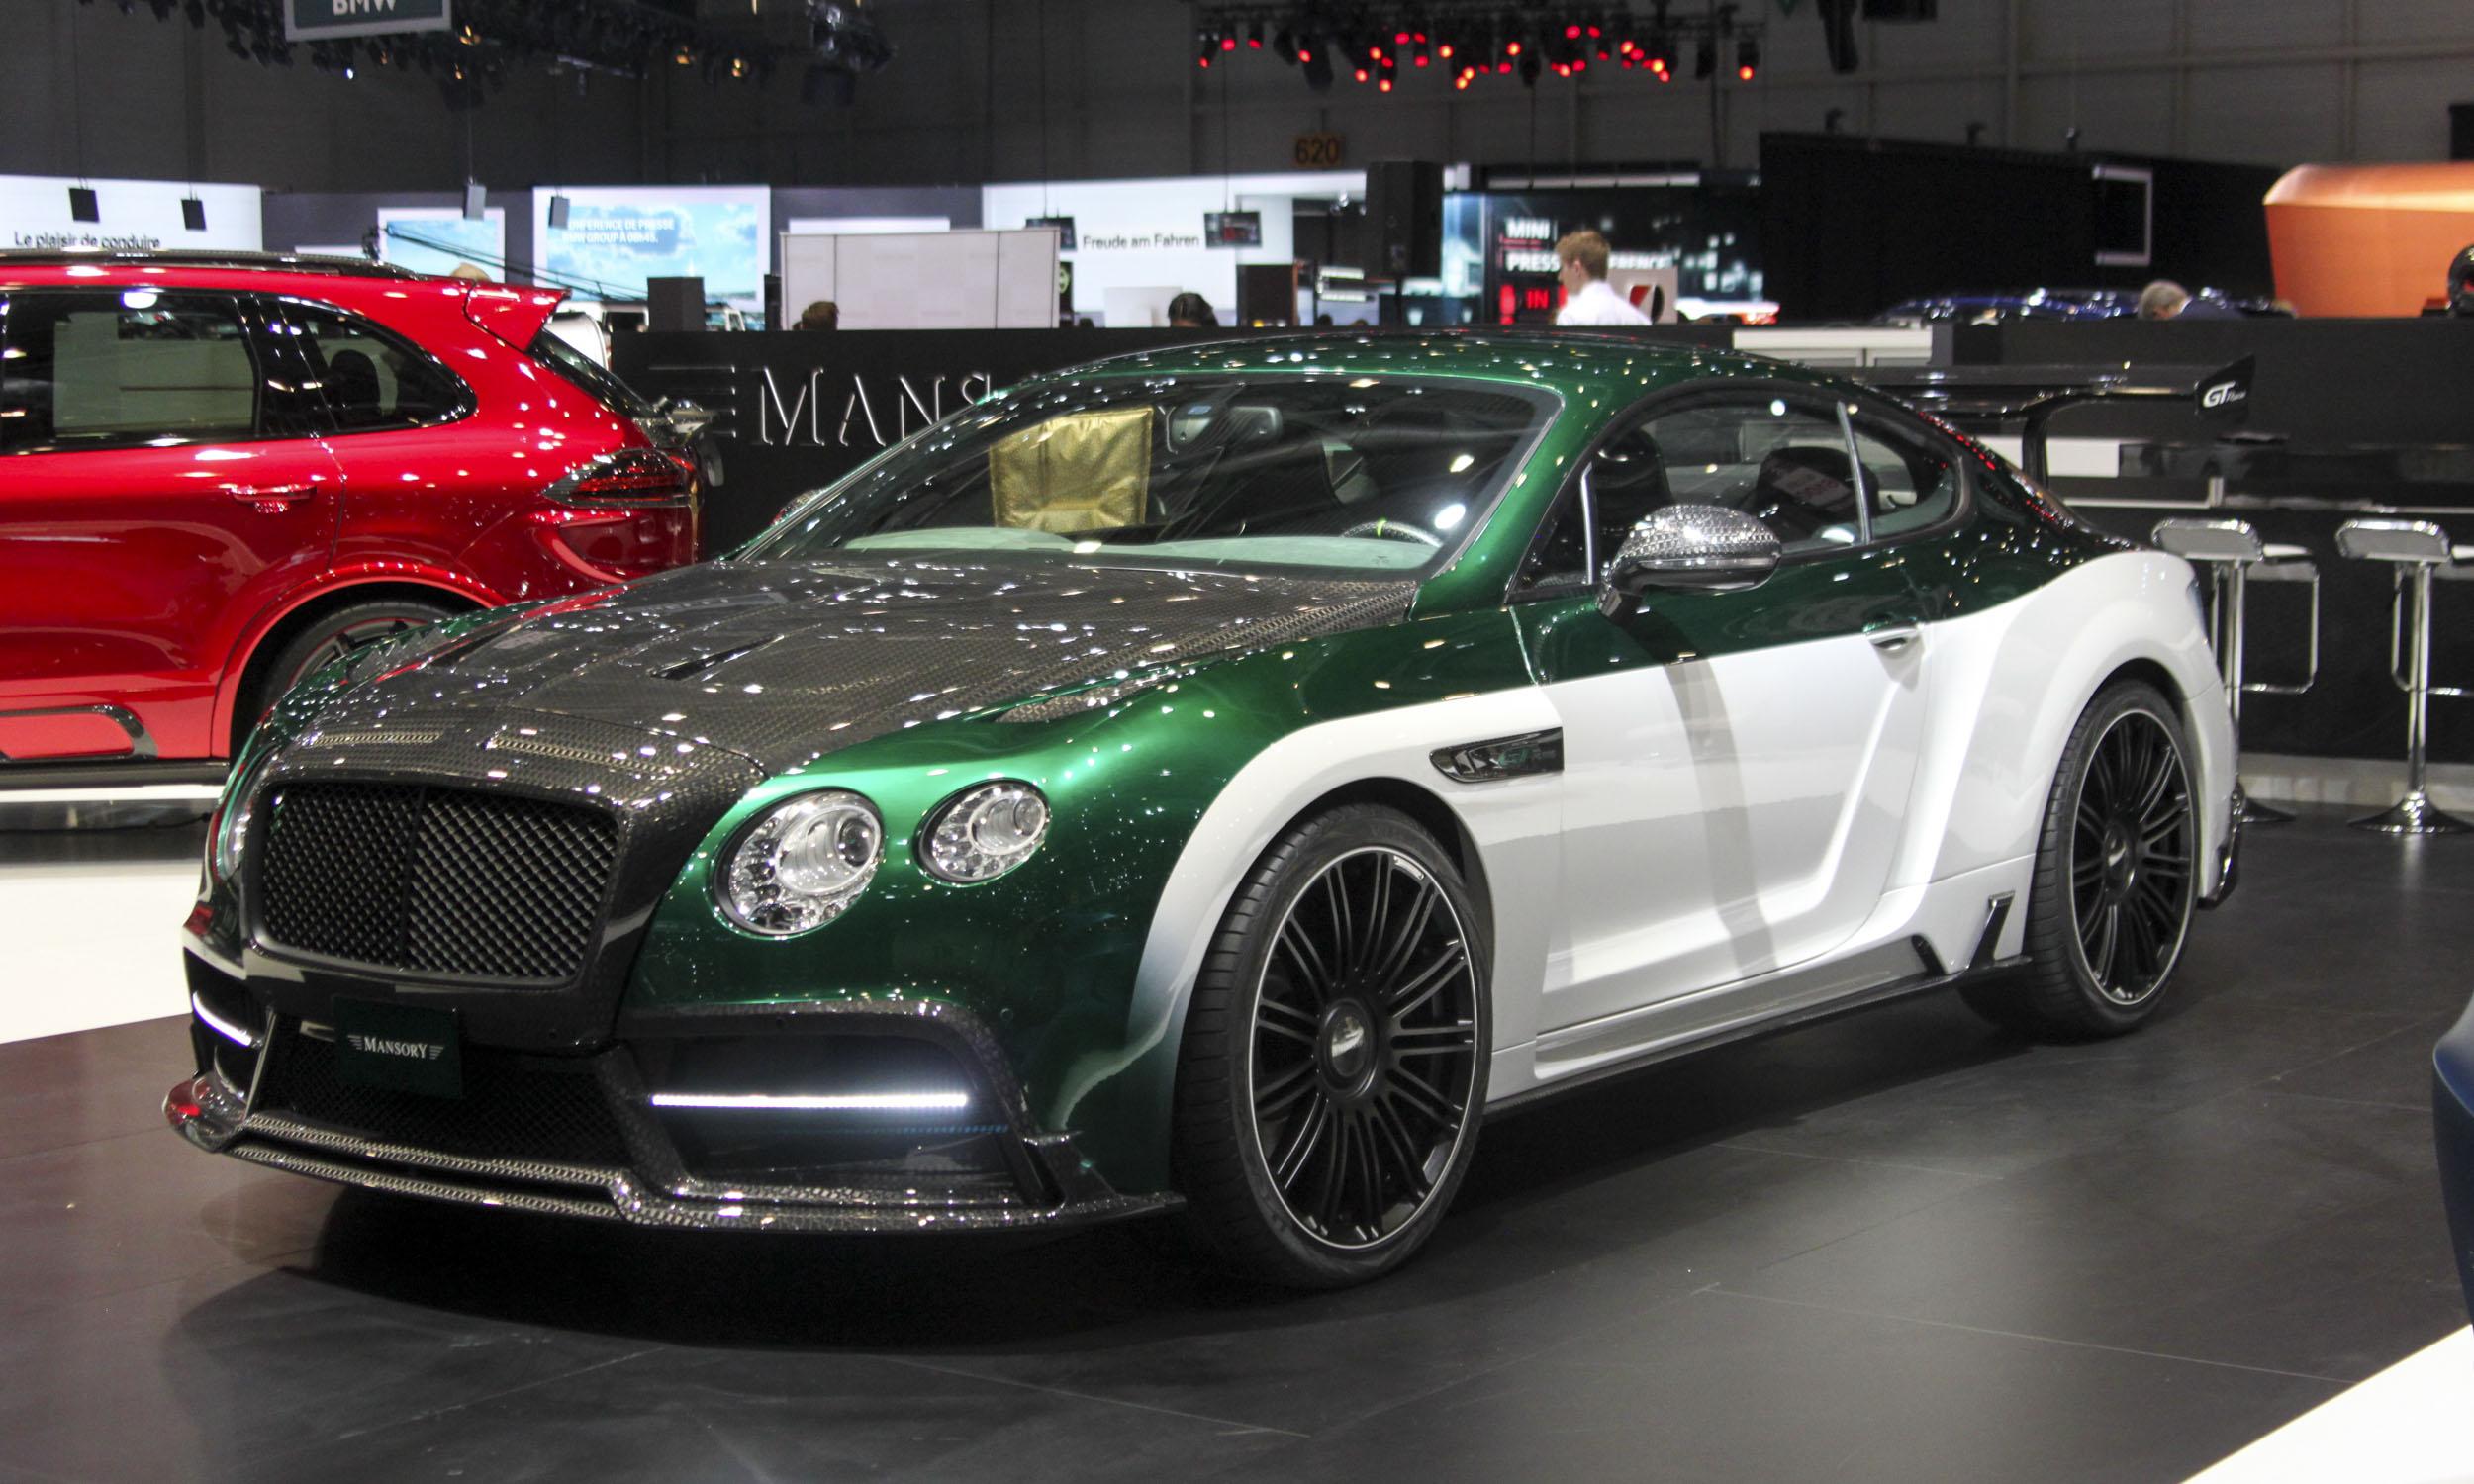 nice BENTLEY photo found on the web | Voiture bentley ...  |Really Nice Bentley